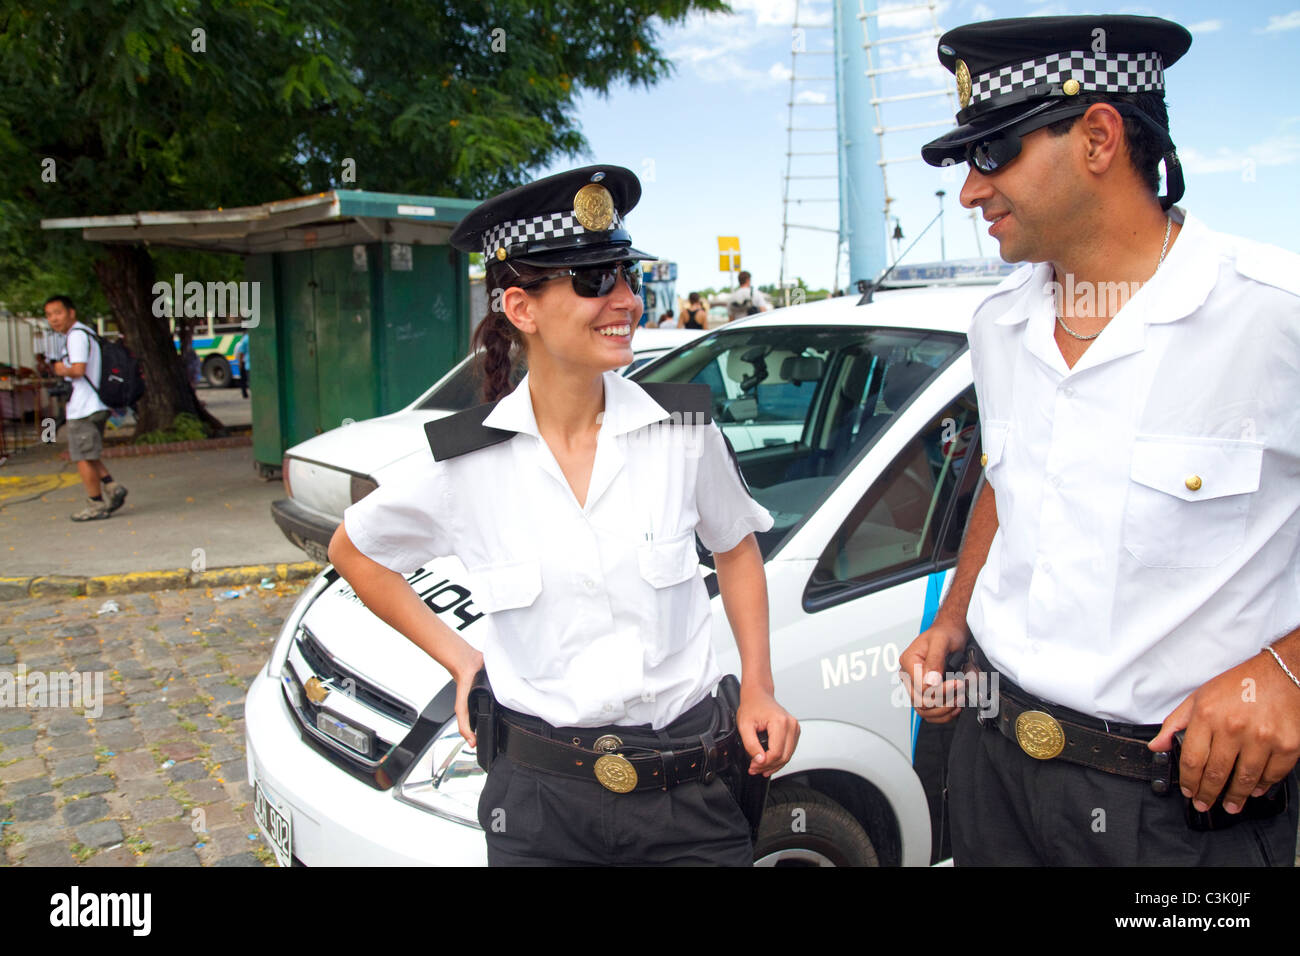 Metropolitan police of Buenos Aires, Argentina. - Stock Image